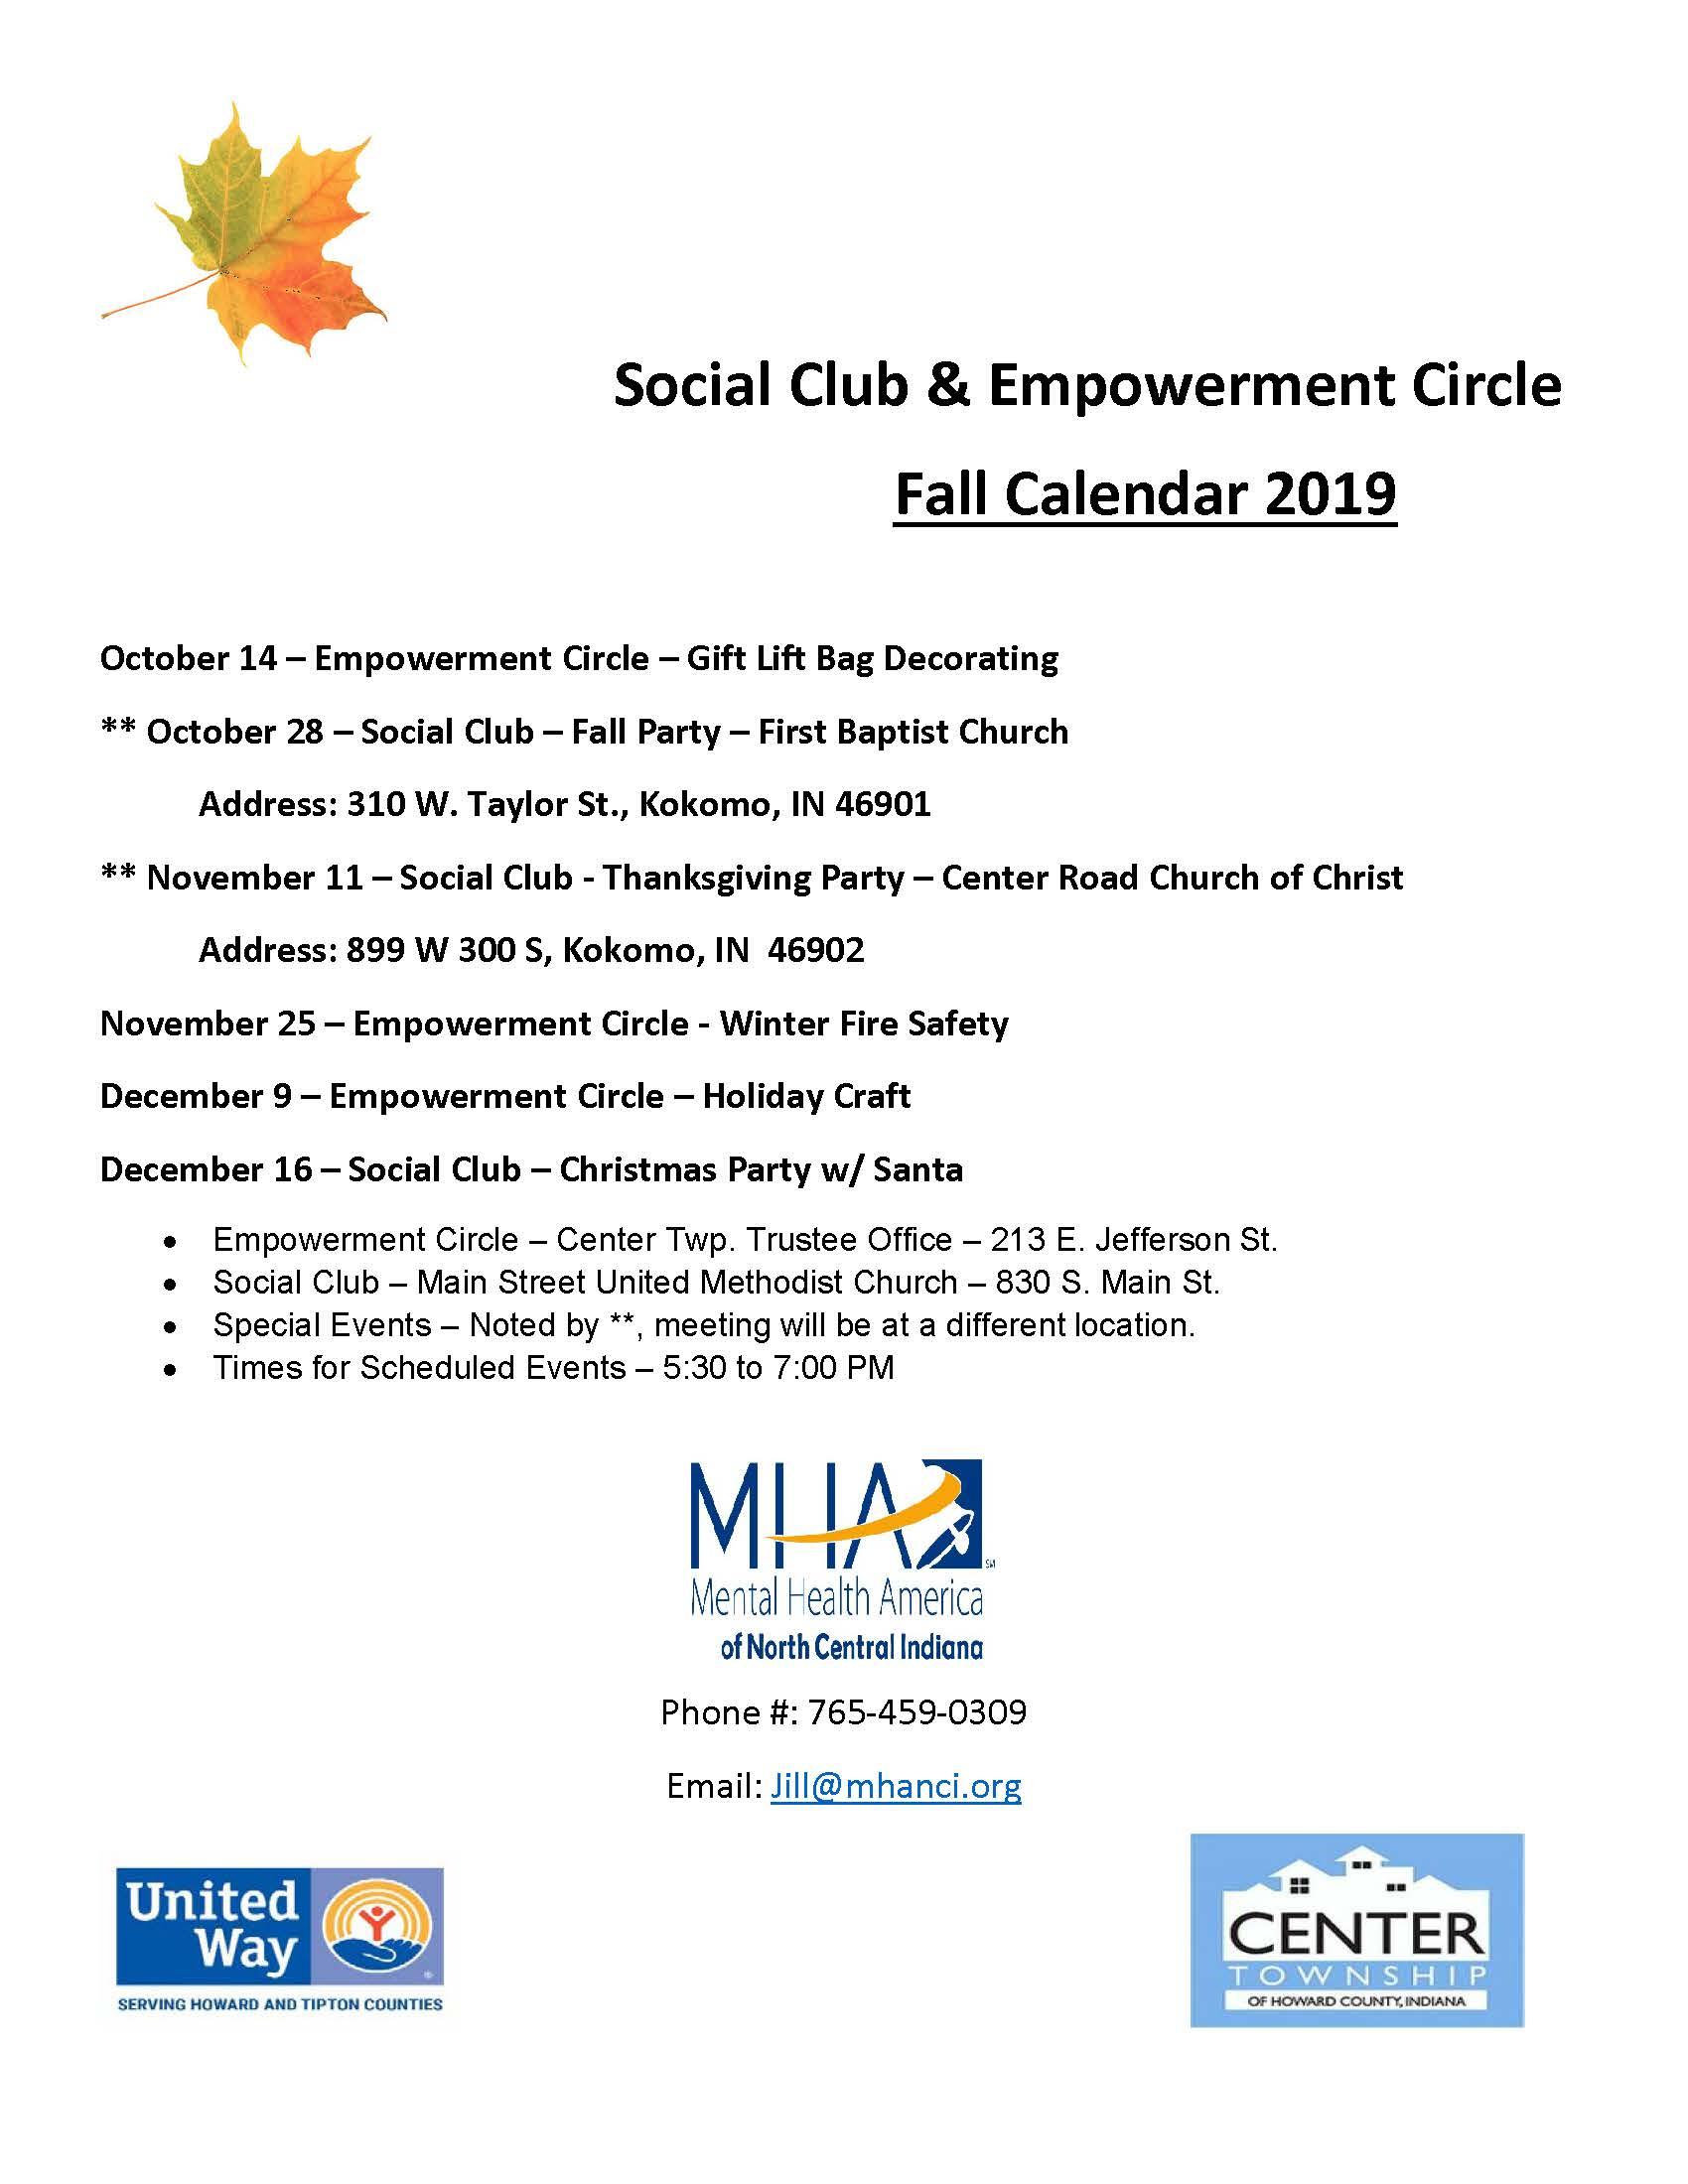 Social Club & Empowerment Circle - 4th Quarter Calendar